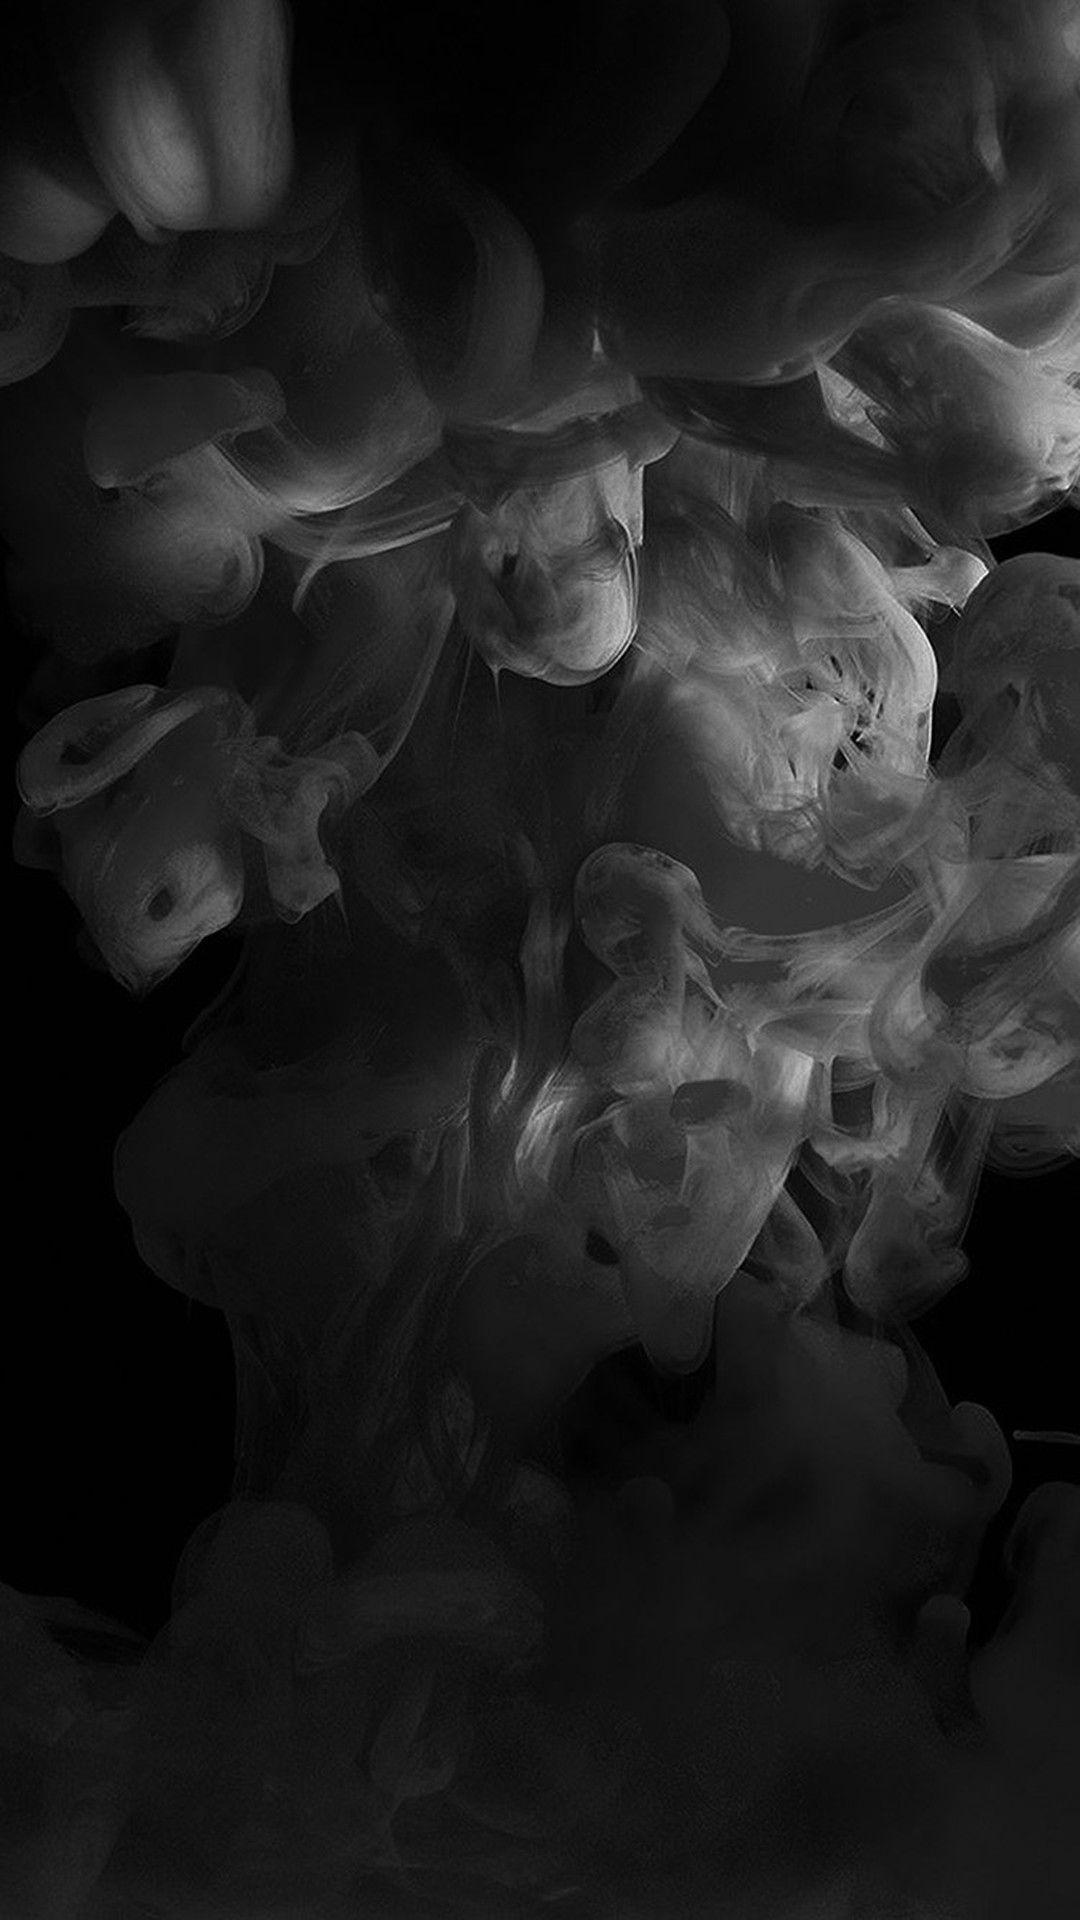 Hd Smoking Mobile Wallpapers Wallpaper Cave